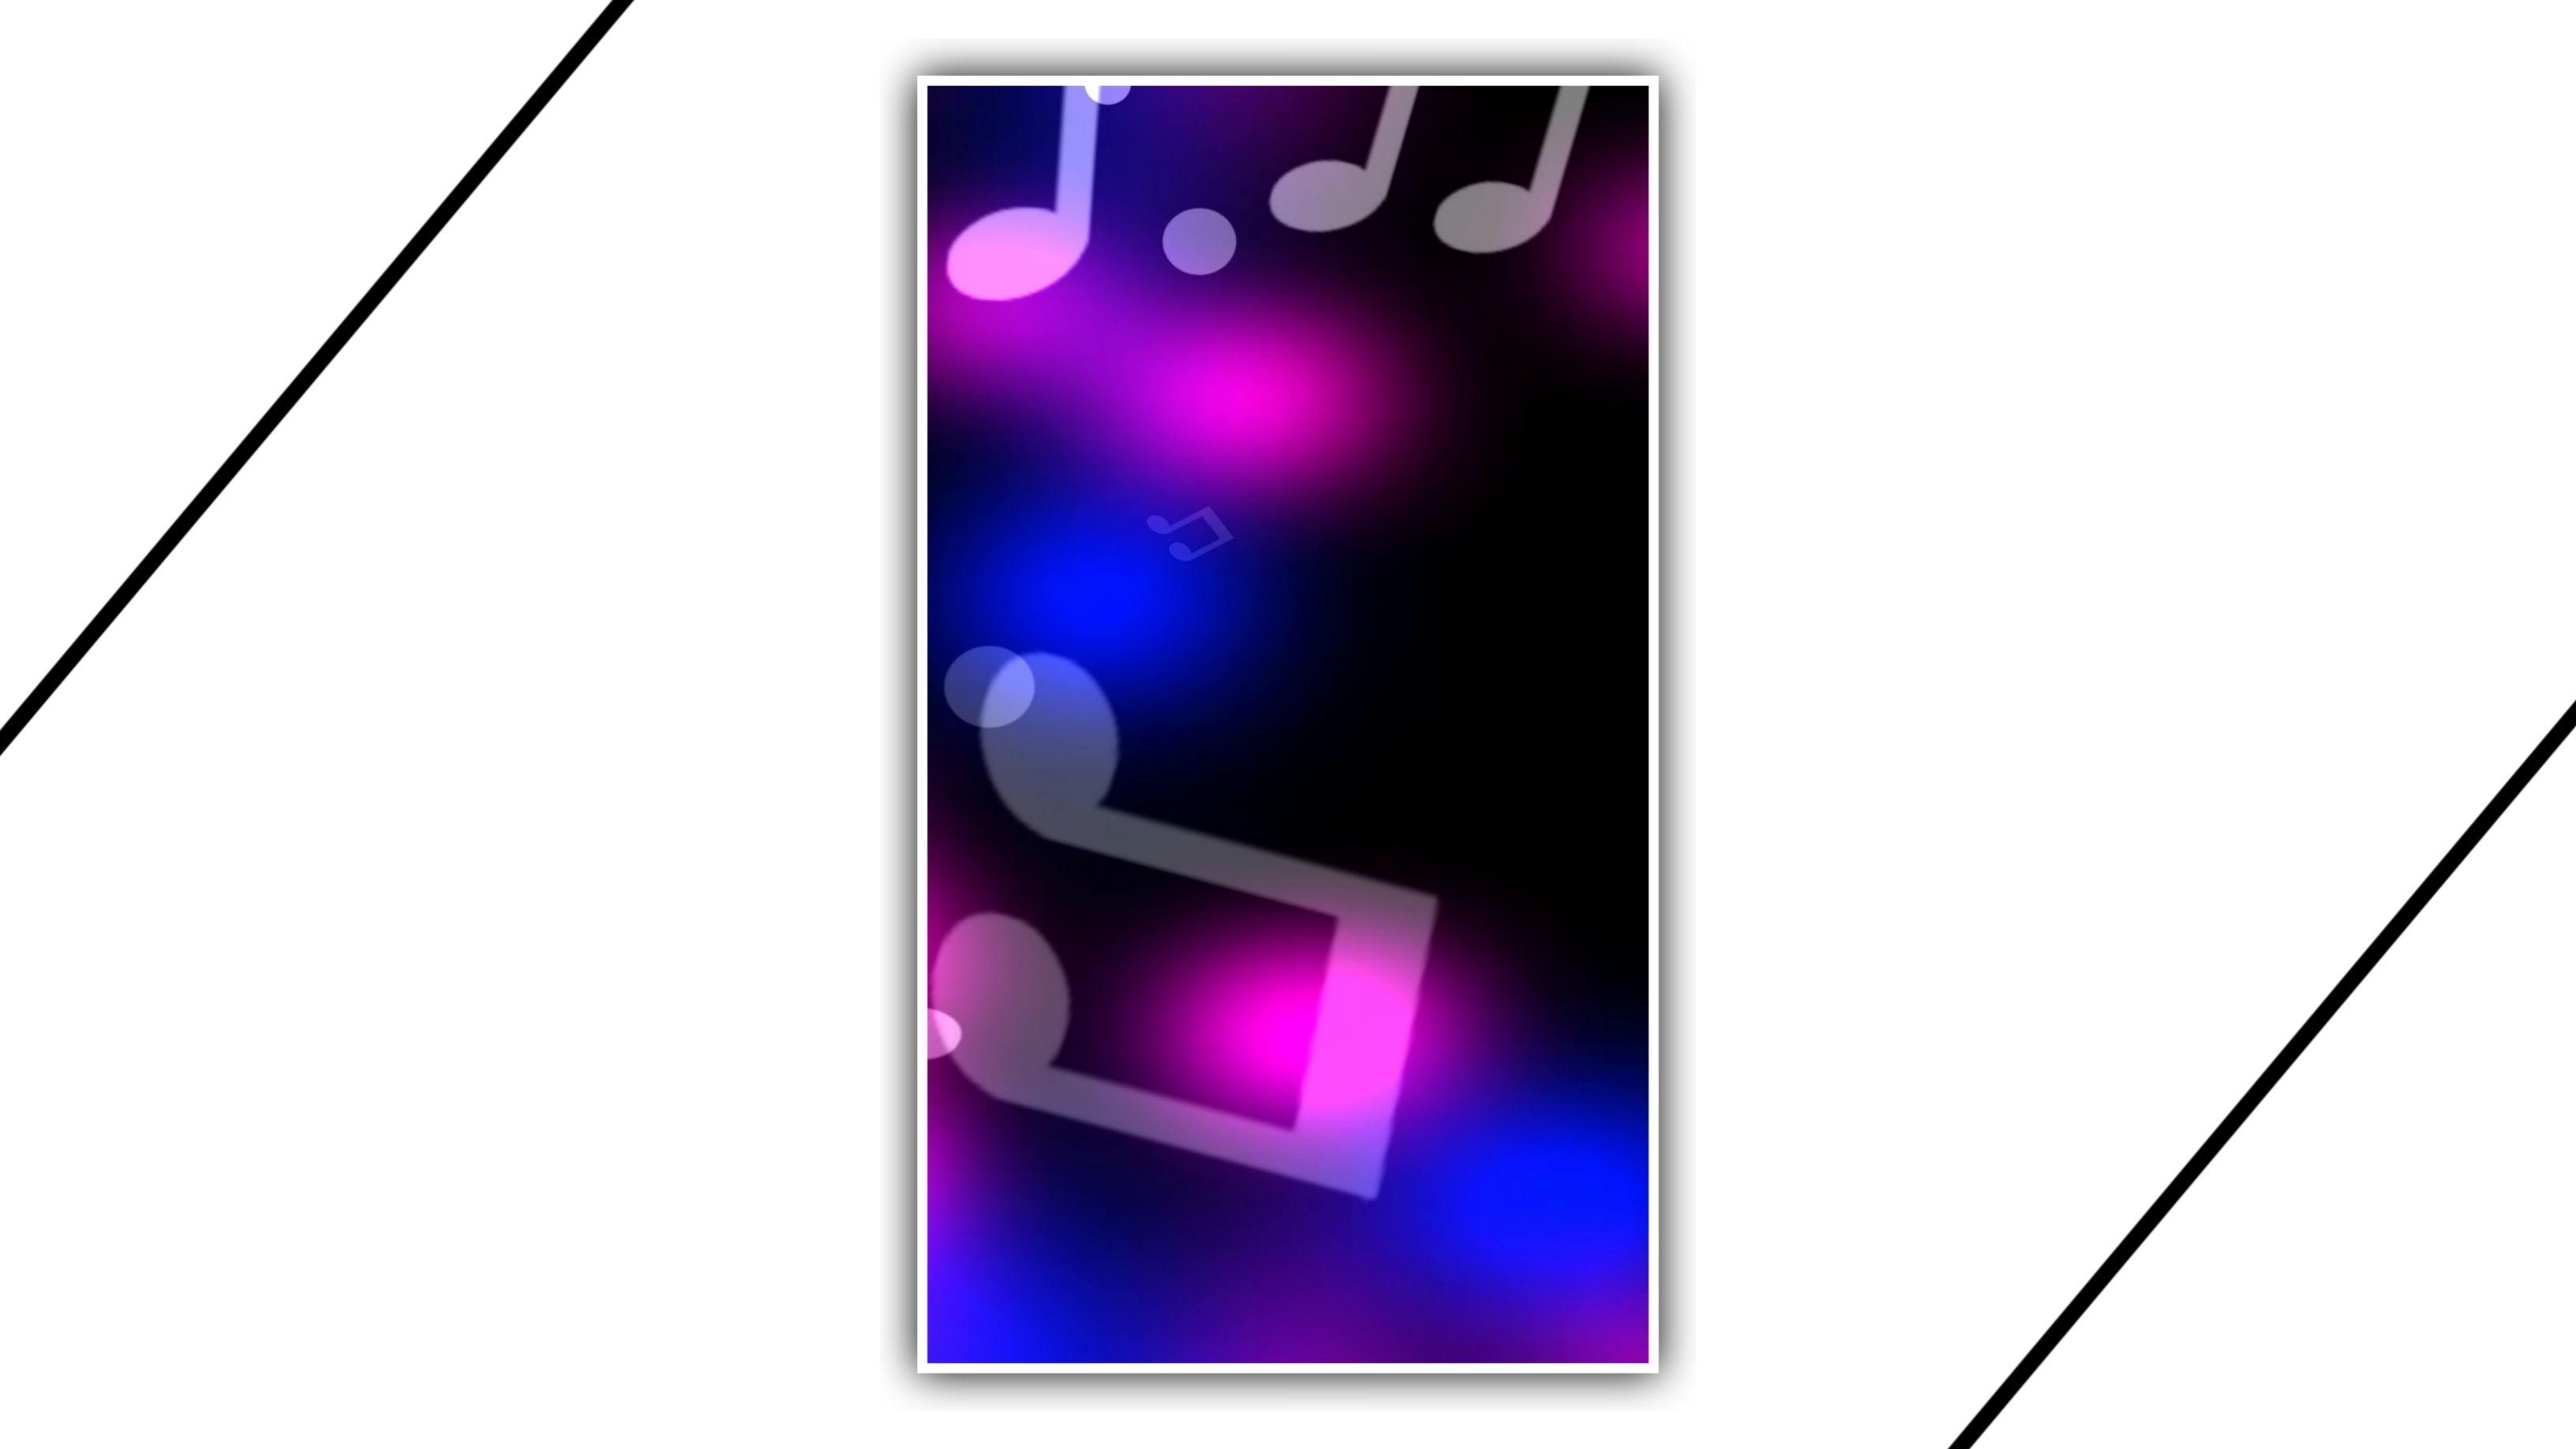 Music Note Spectrum Template Download Kinemaster